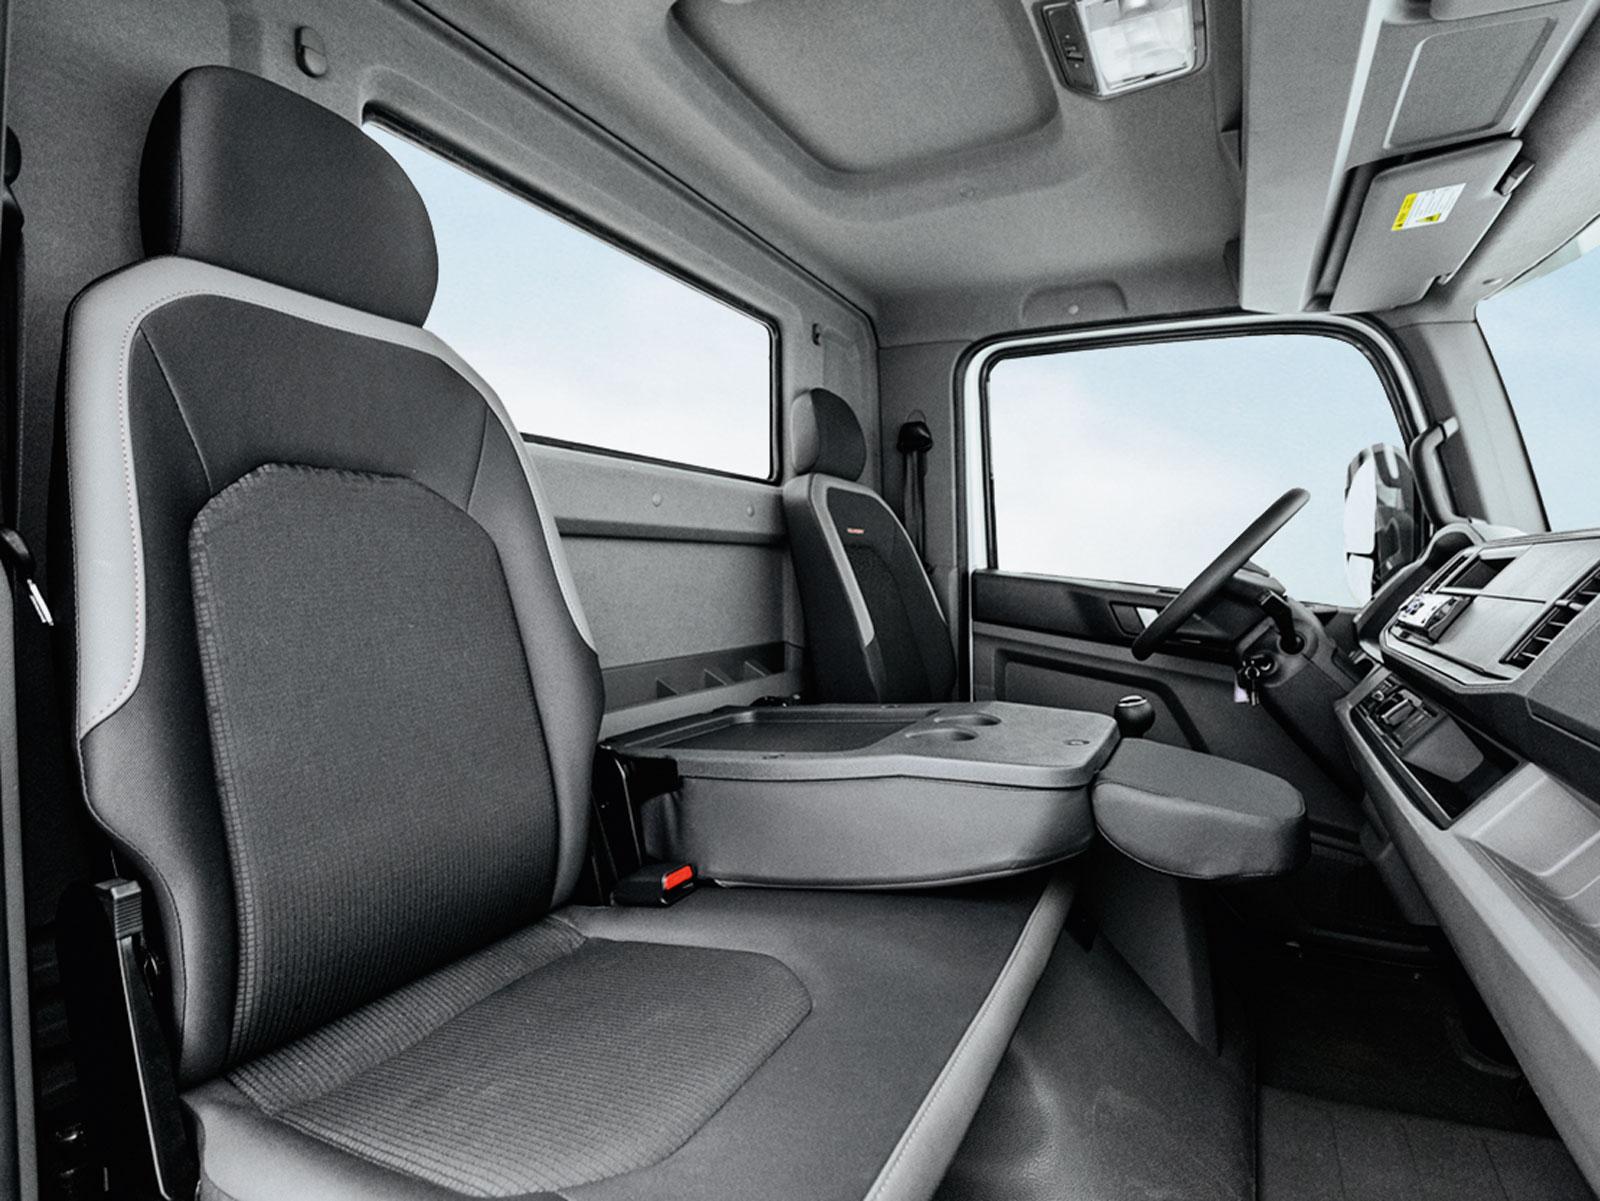 Volkswagen Delivery Express